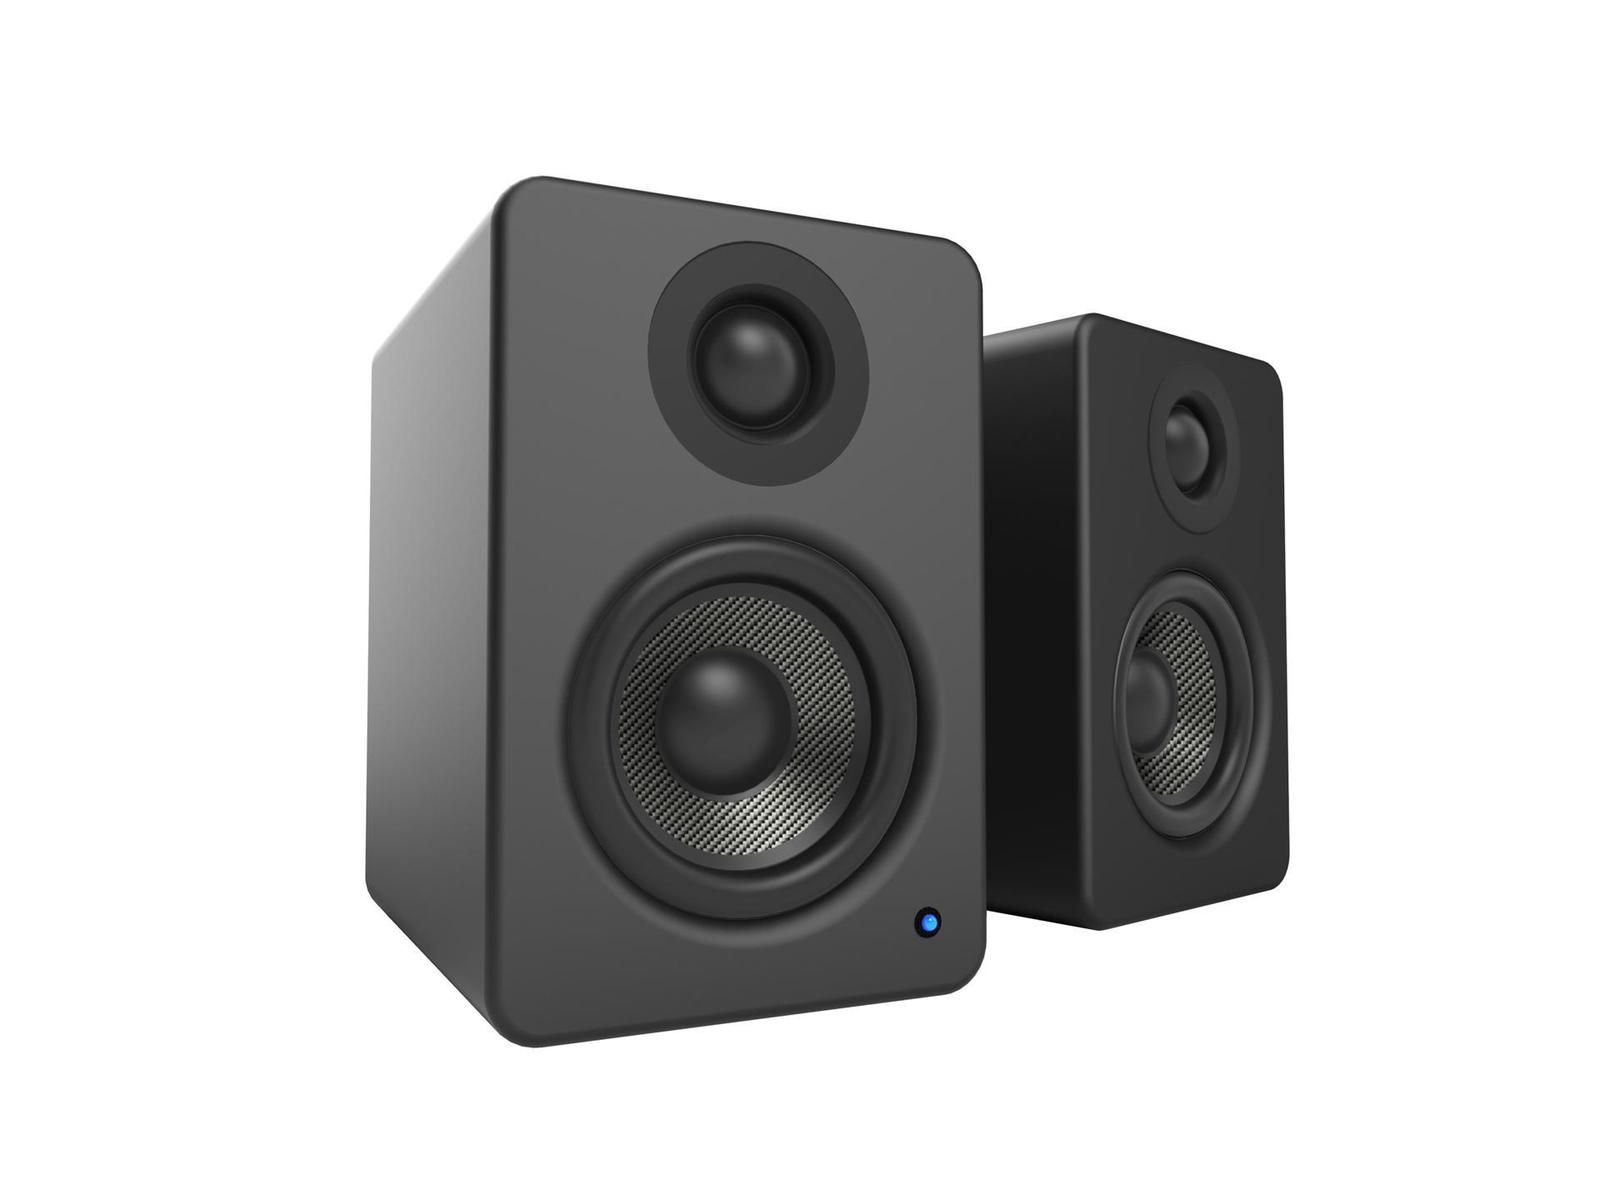 Kanto YU2MB 50 W 2.0 Channel Speakers